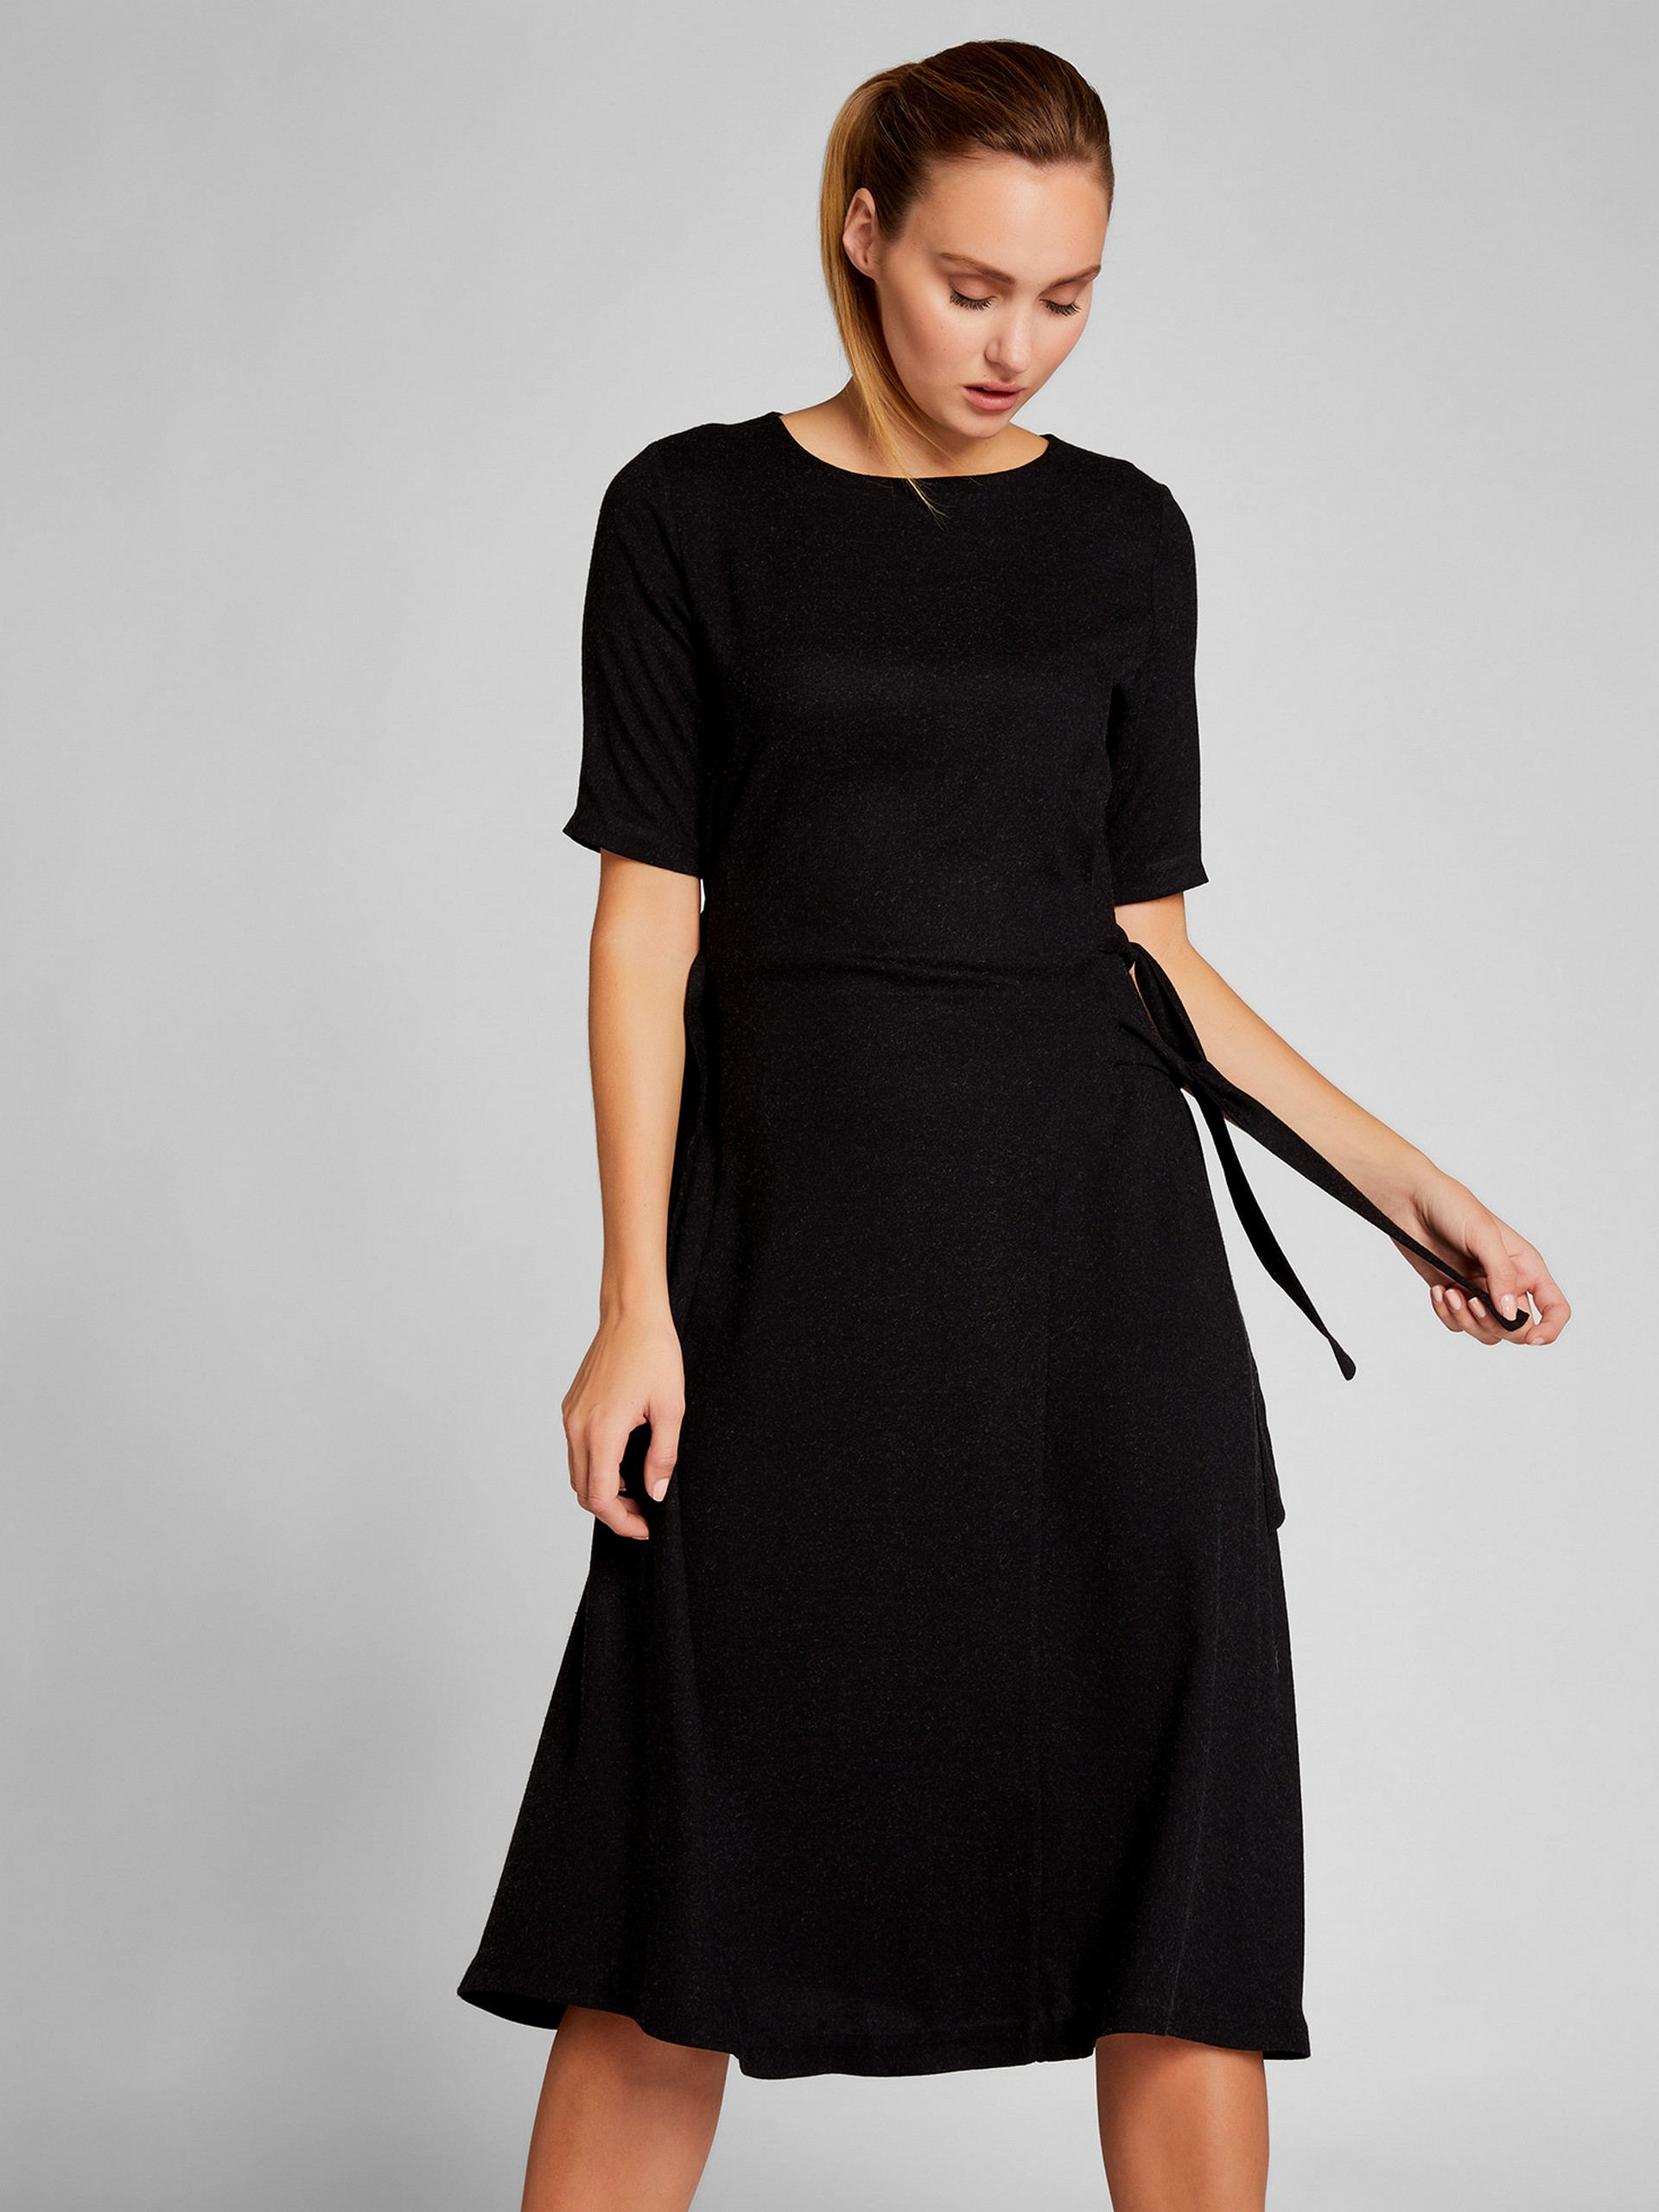 Gathered Waist Short Sleeve Dress